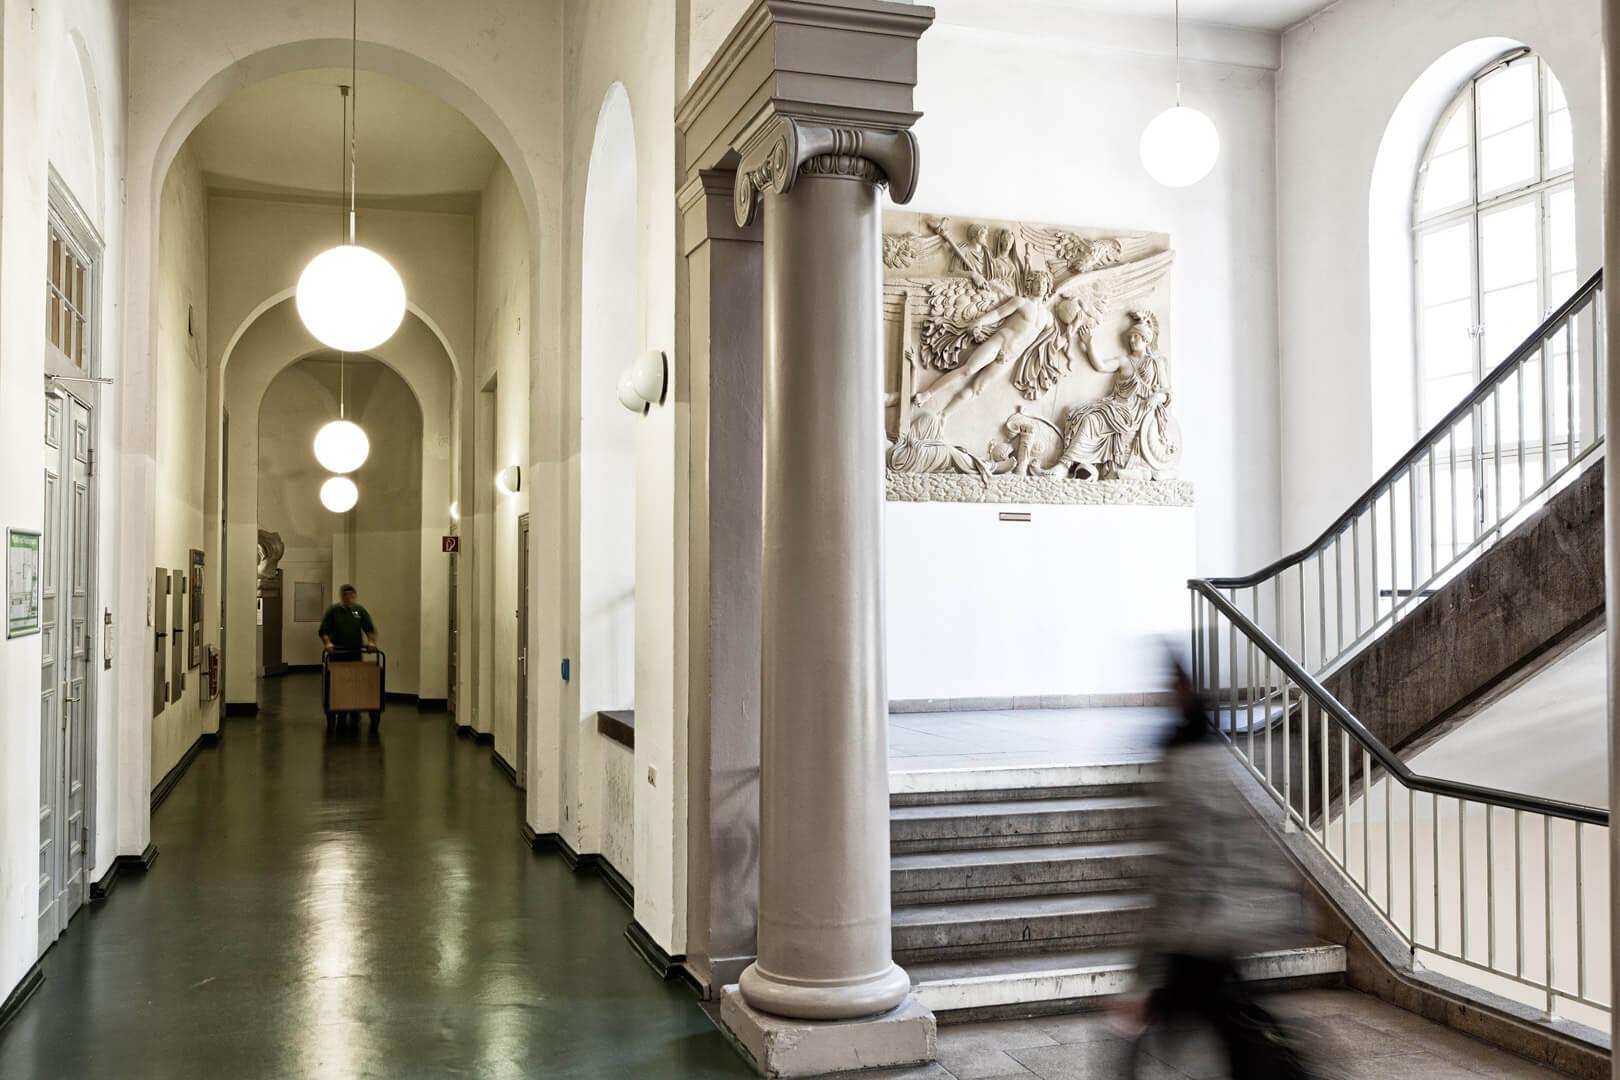 Universität, Berlin